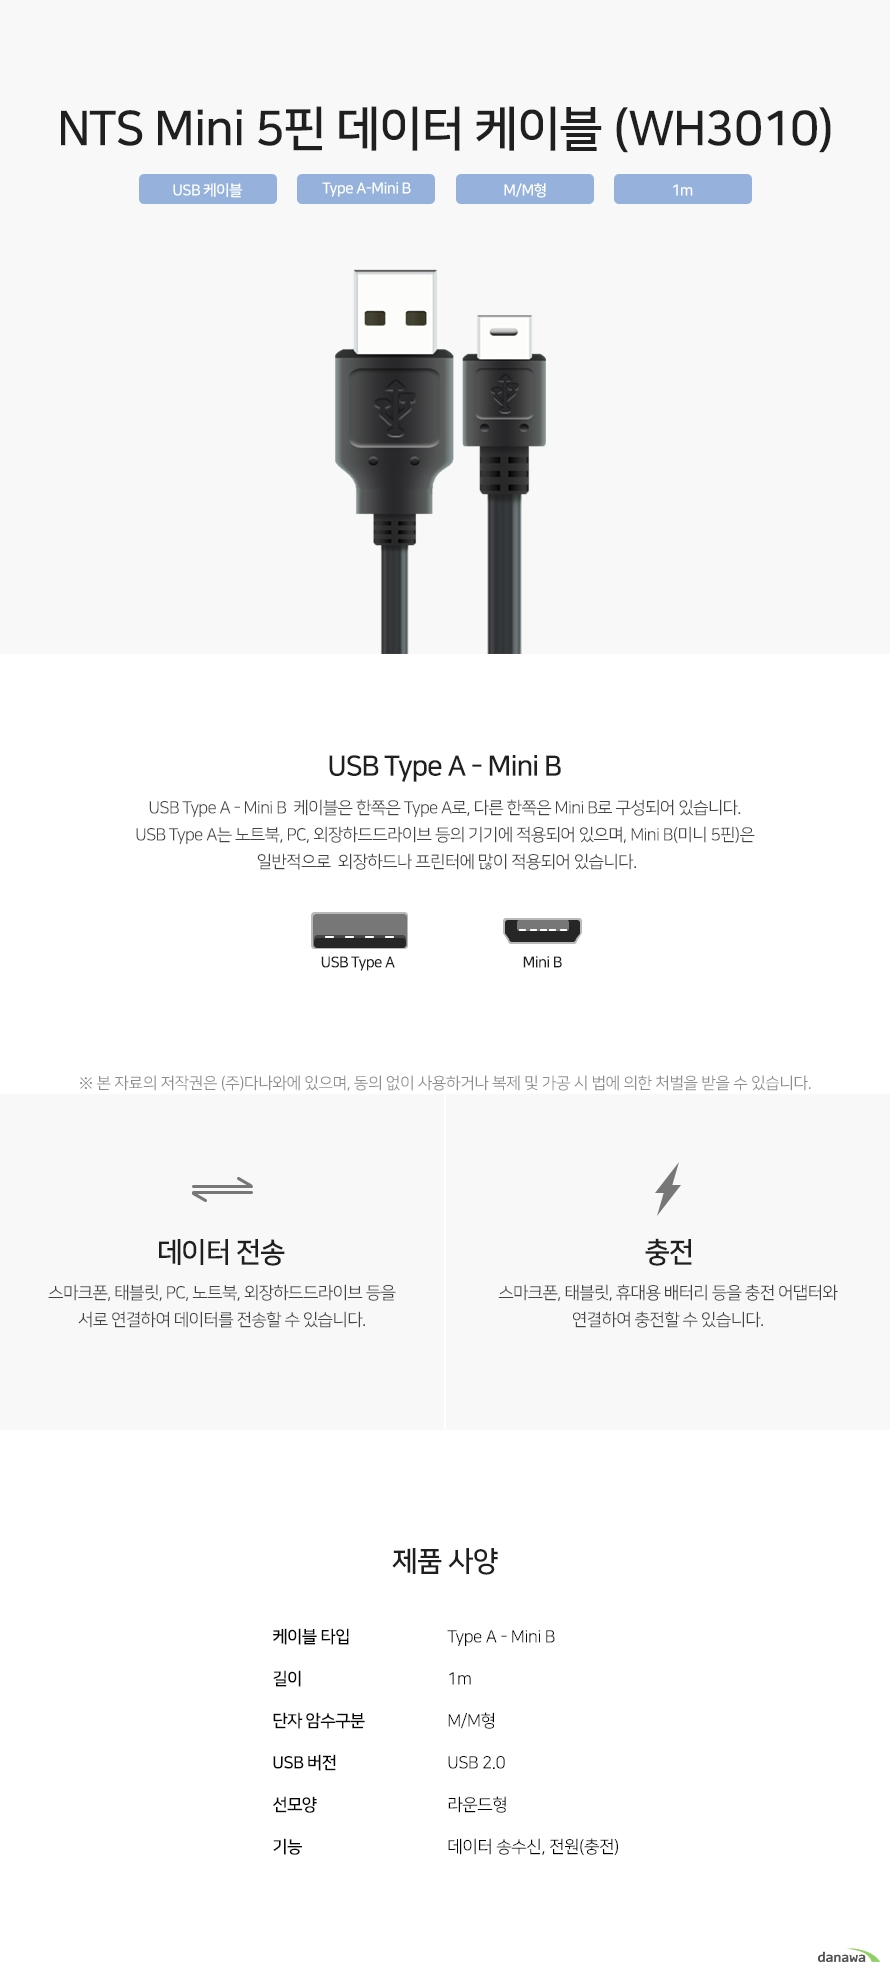 NTS Mini 5핀 데이터 케이블 (WH3010) USB Type A - Mini B  케이블은 한쪽은 Type A로, 다른 한쪽은 Mini B로 구성되어 있습니다. USB Type A는 노트북, PC, 외장하드드라이브 등의 기기에 적용되어 있으며, Mini B(미니 5핀)은  일반적으로  외장하드나 프린터에 많이 적용되어 있습니다. 스마크폰, 태블릿, PC, 노트북, 외장하드드라이브 등을 서로 연결하여 데이터를 전송할 수 있습니다. 스마크폰, 태블릿, 휴대용 배터리 등을 충전 어댑터와 연결하여 충전할 수 있습니다.